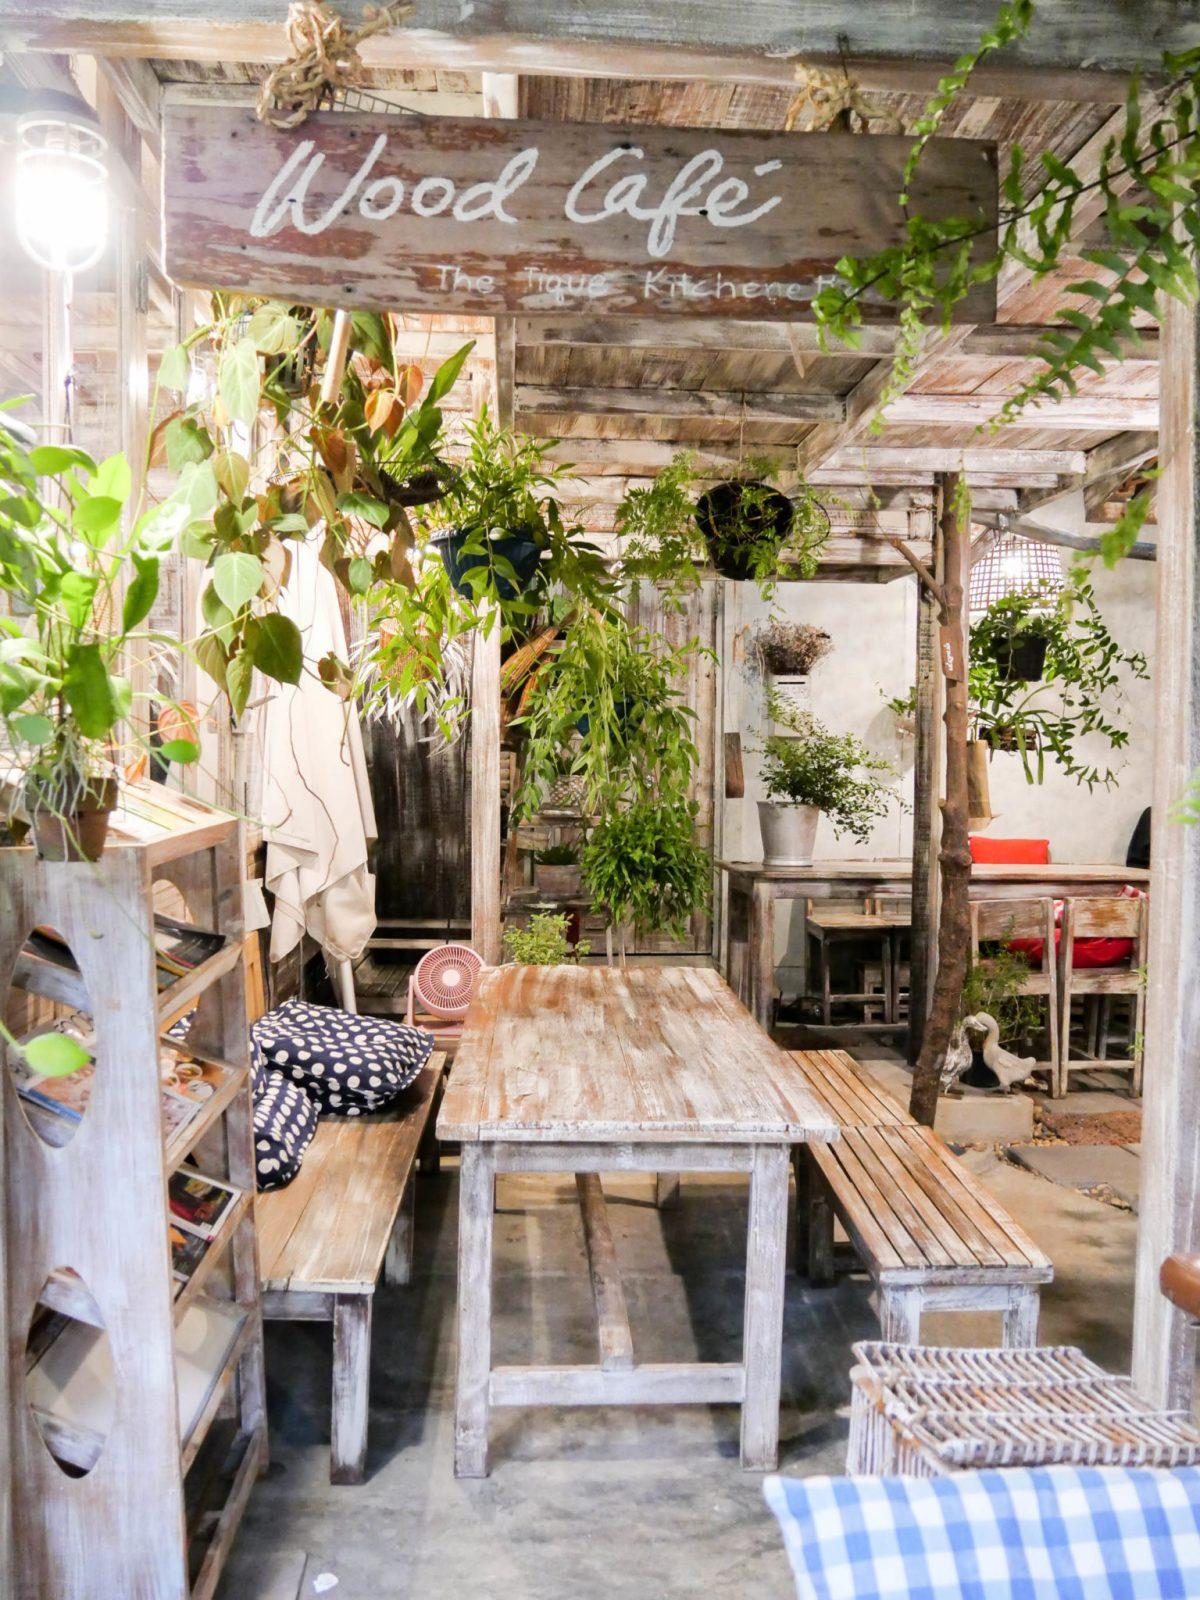 "7 Simply Creative Cafe & Bar ในย่านไลฟ์สไลต์สุดฮิป กับ 24 Hr. Co-Working Space กลาง New Interchange ""รัชดา - ลาดพร้าว"" 37 - cafe"